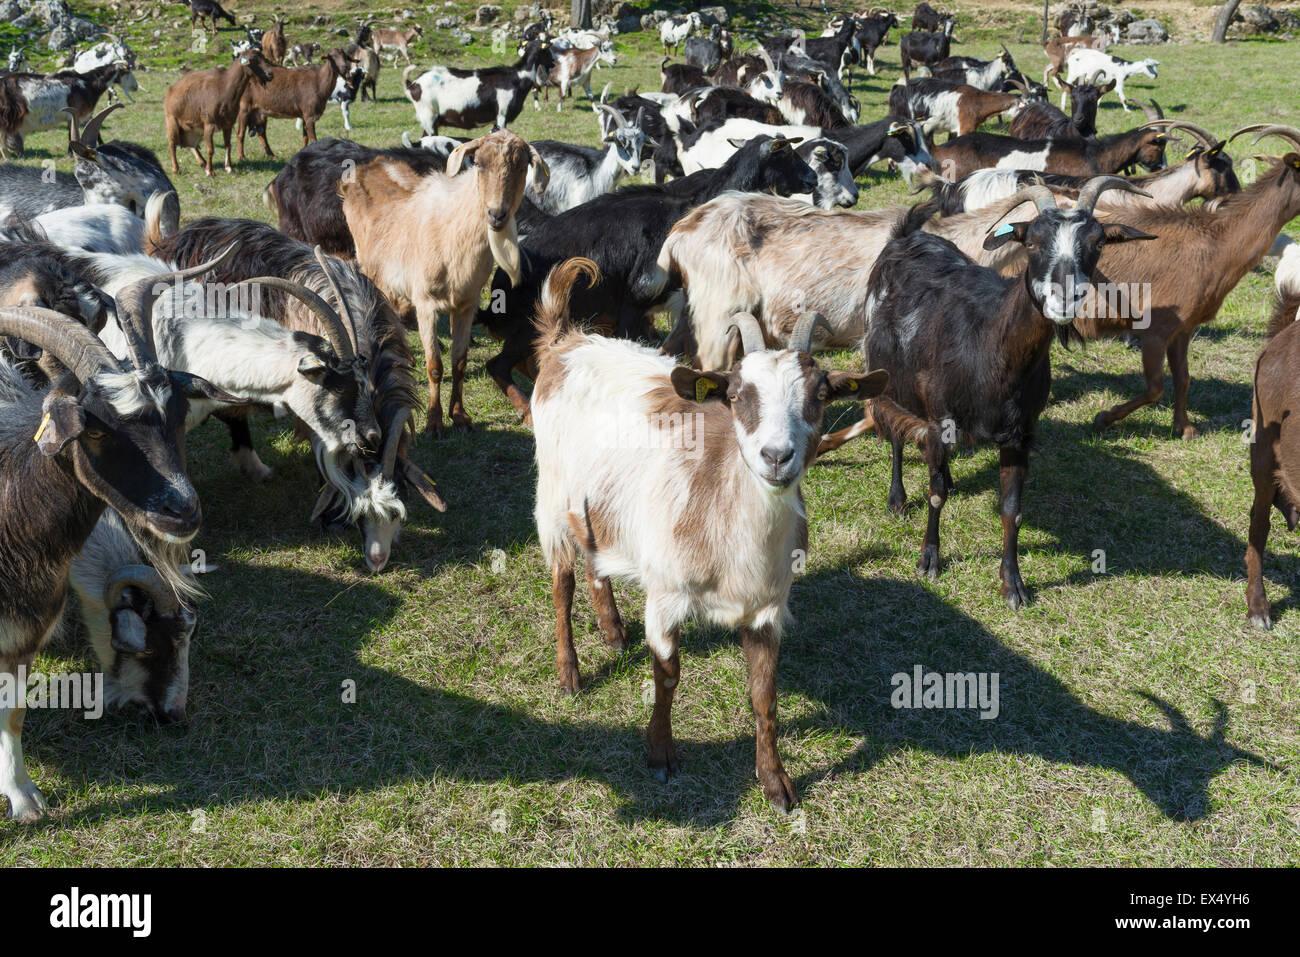 Herd of goats in pasture, Curel, Provence-Alpes-Côte d'Azur, France - Stock Image